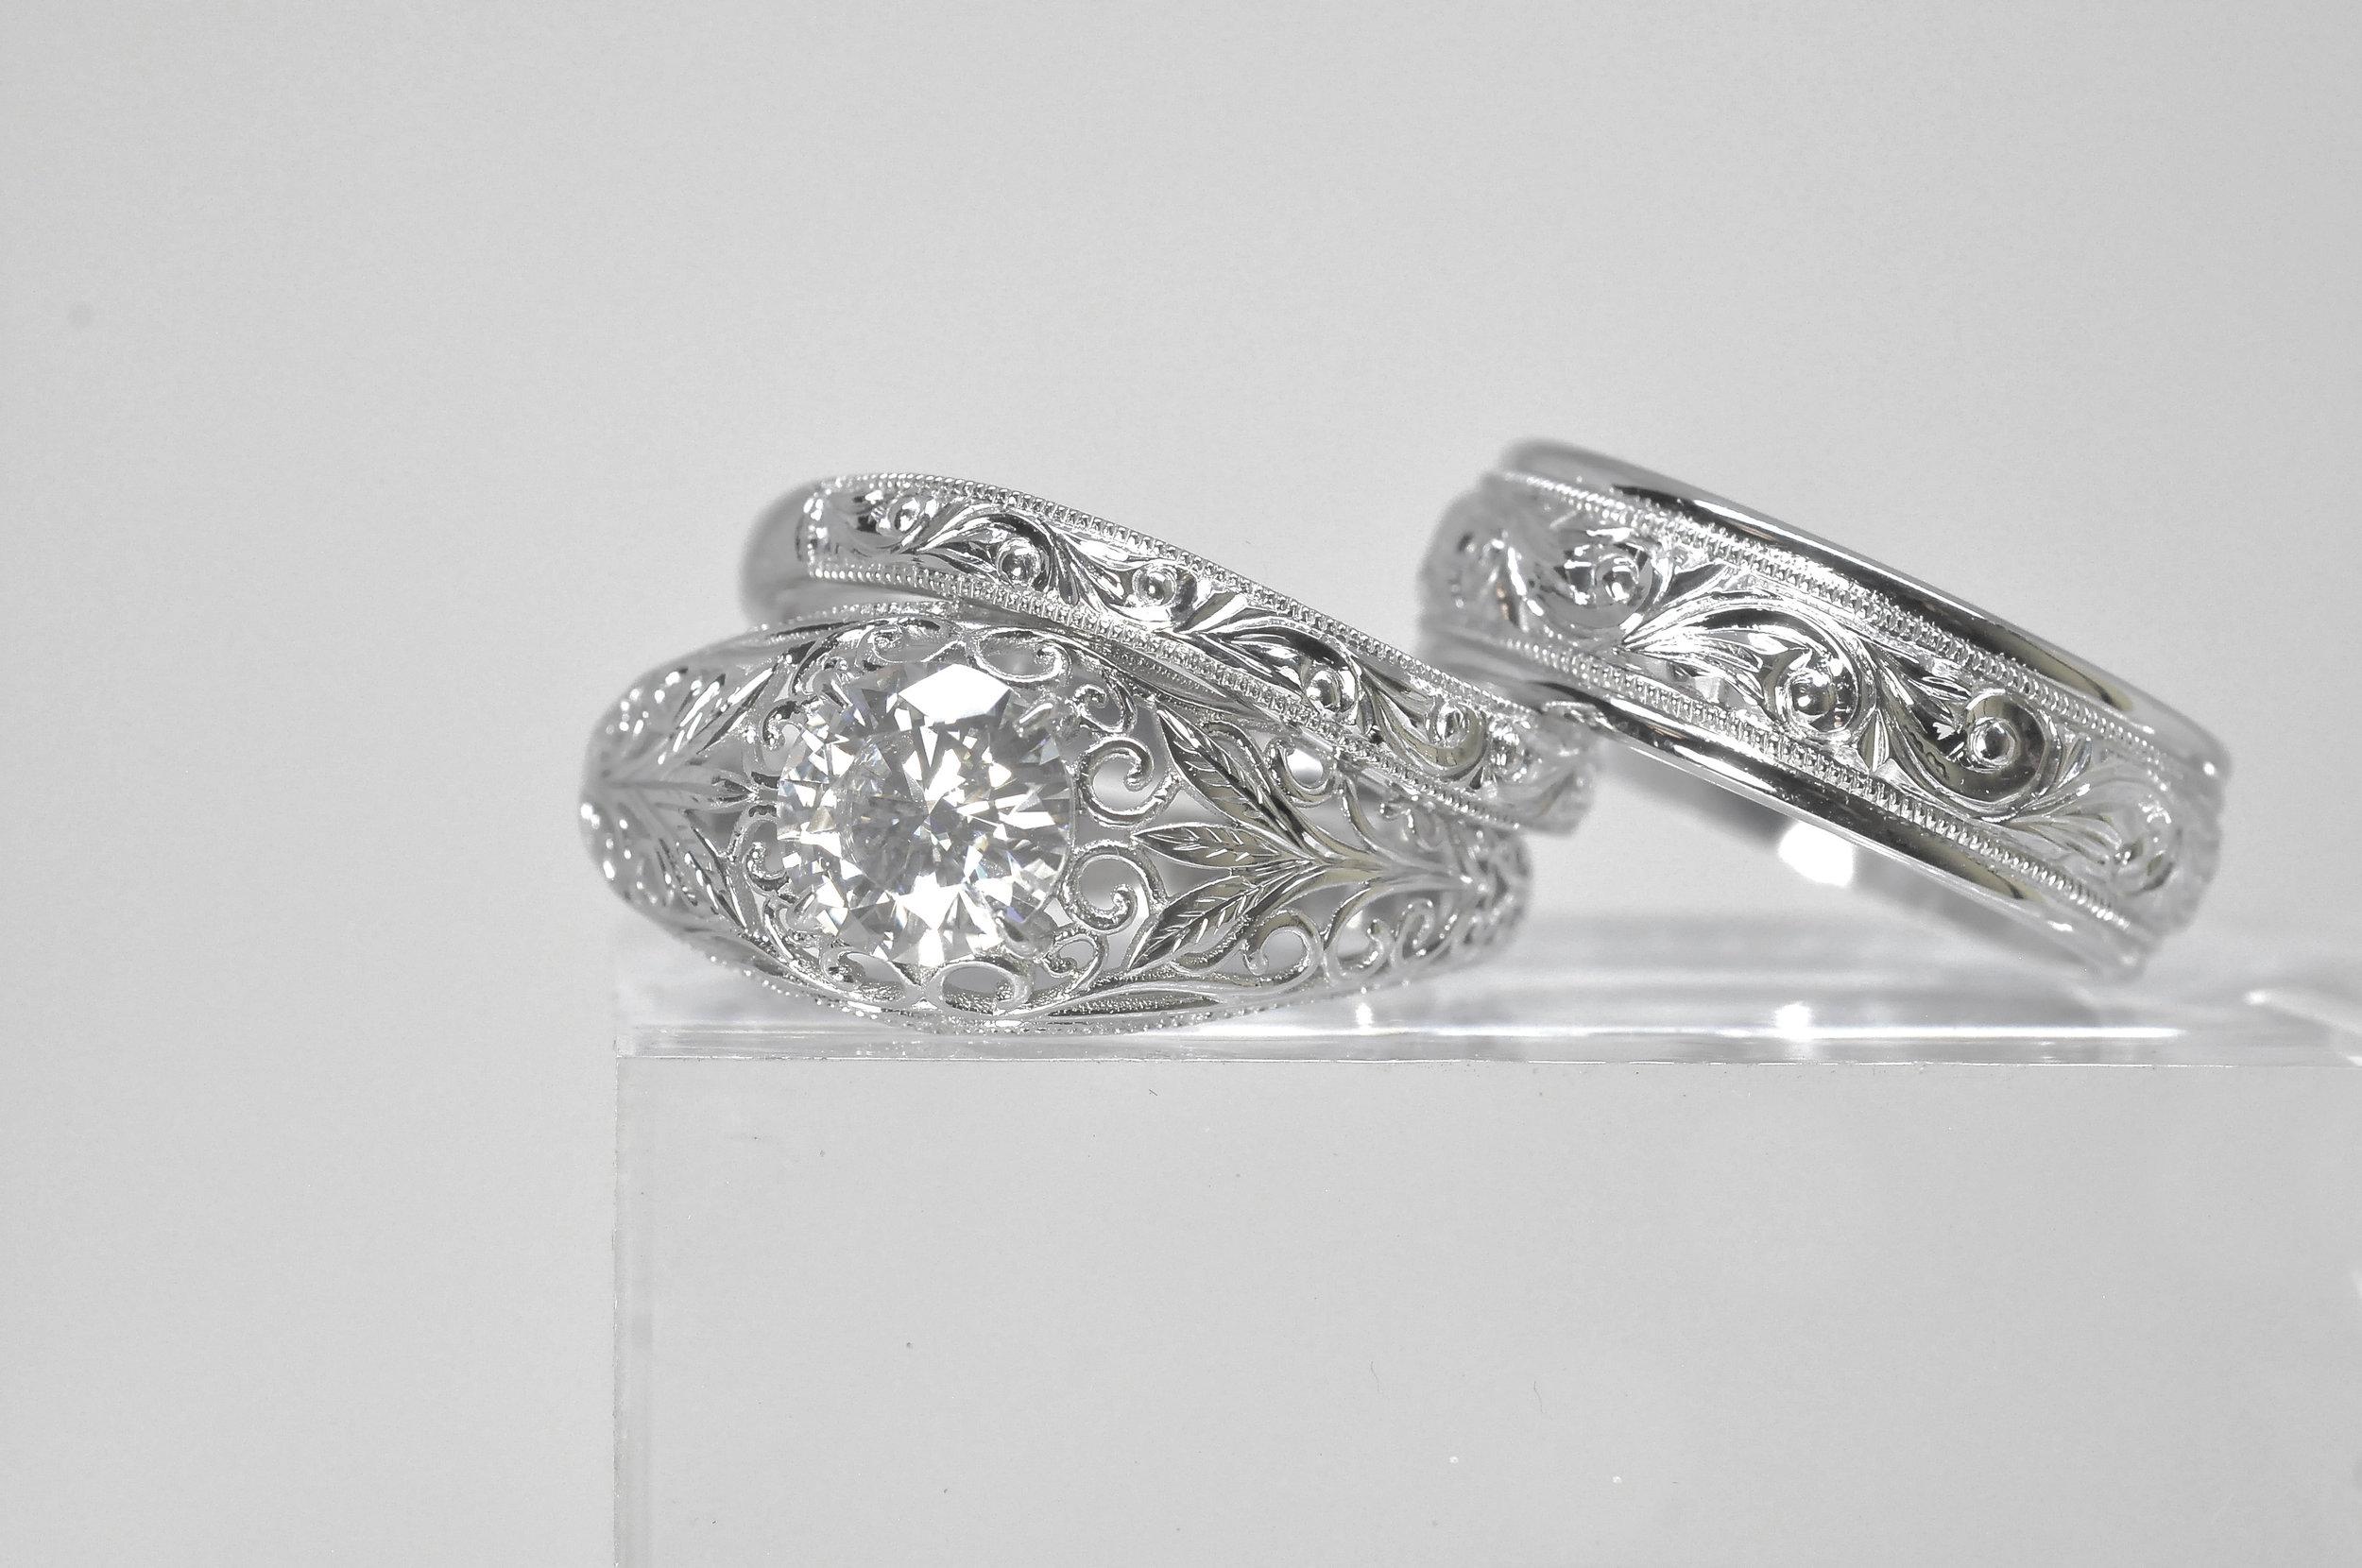 Hand Engraved Engagement Ring.jpg